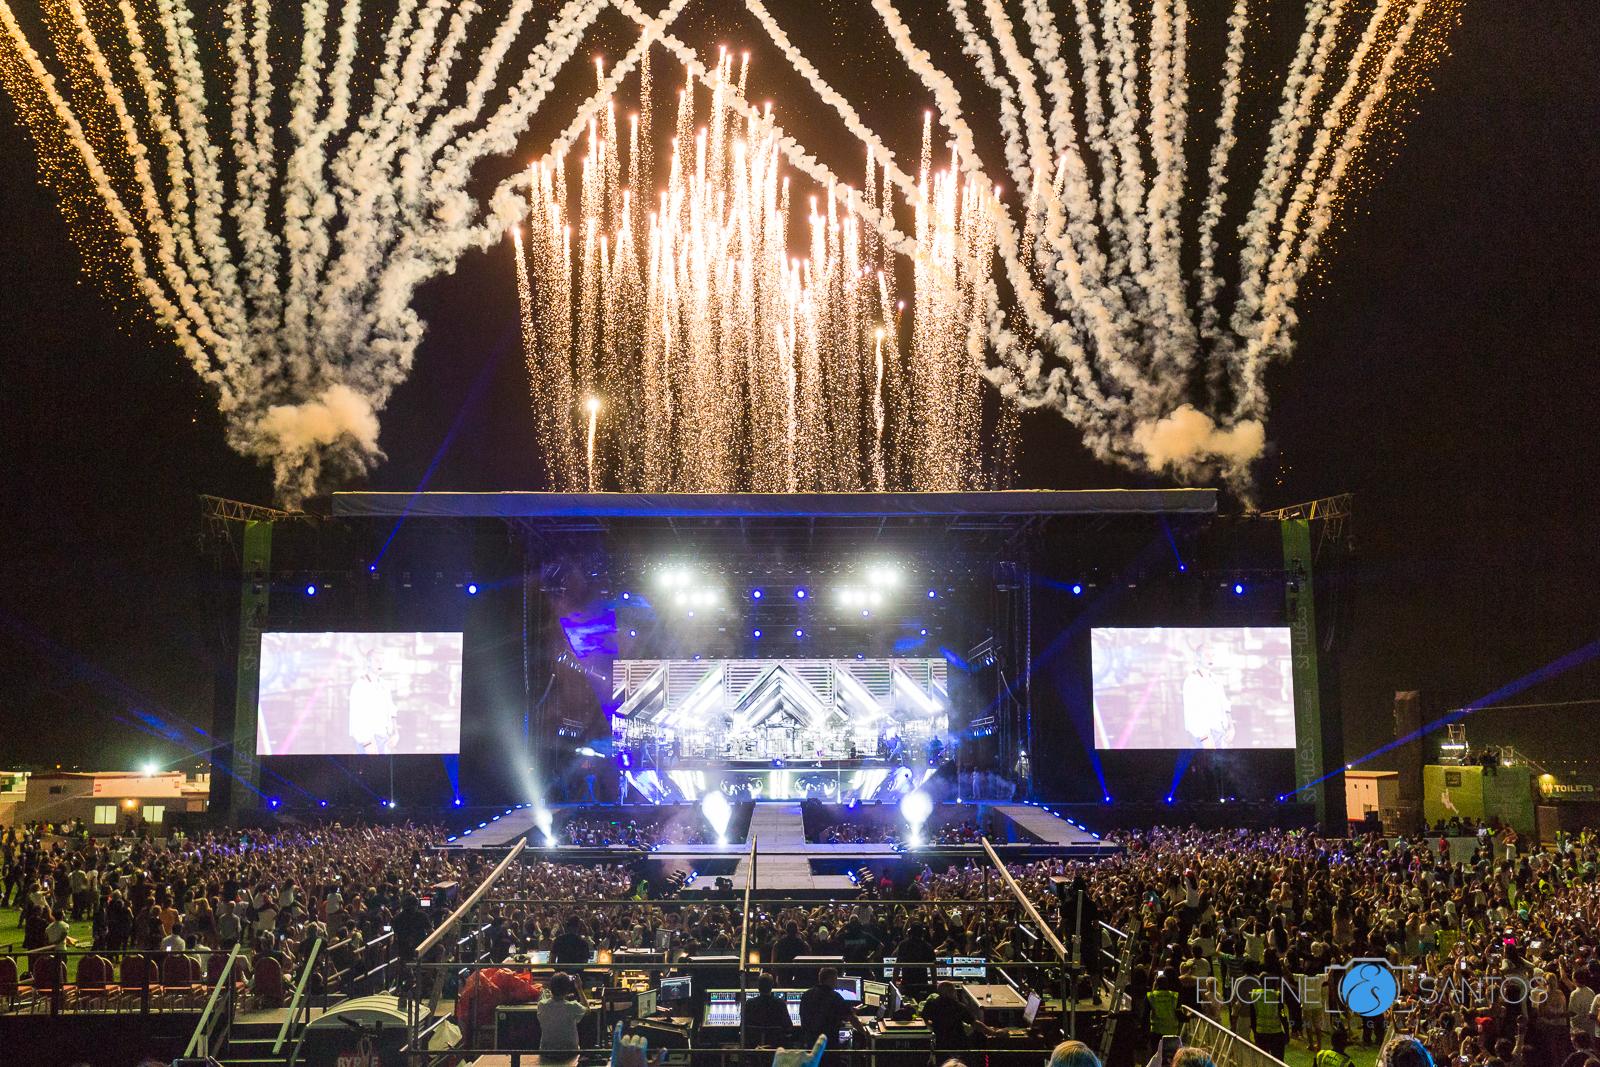 Justin Bieber Purpose Tour Dubai (5 of 7